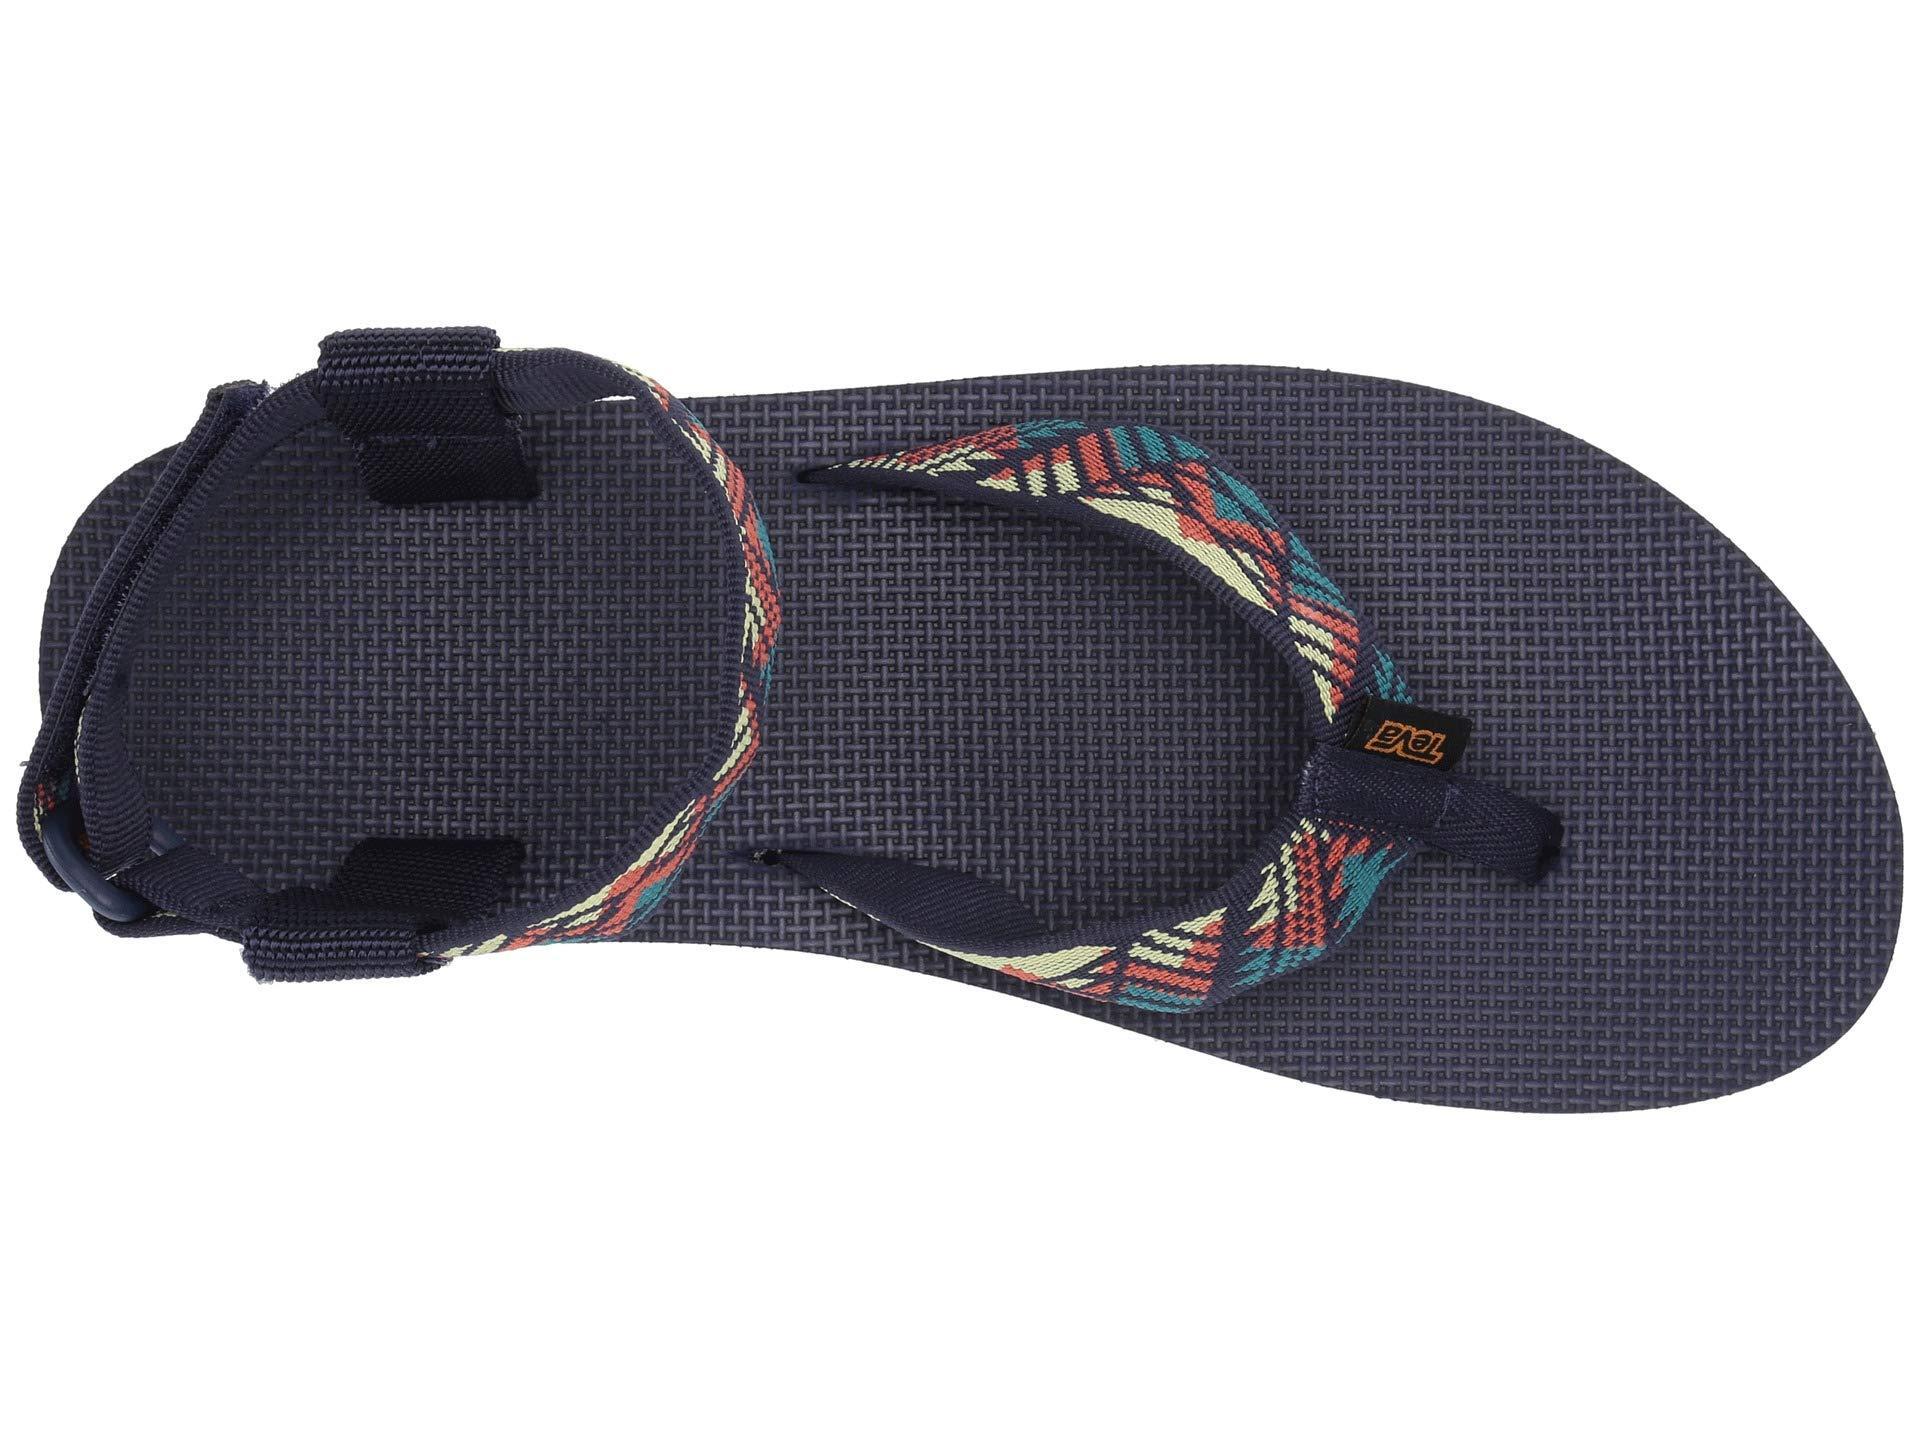 805ac23a379115 Lyst - Teva Original Sandal - Urban (black) Men s Sandals in Blue ...